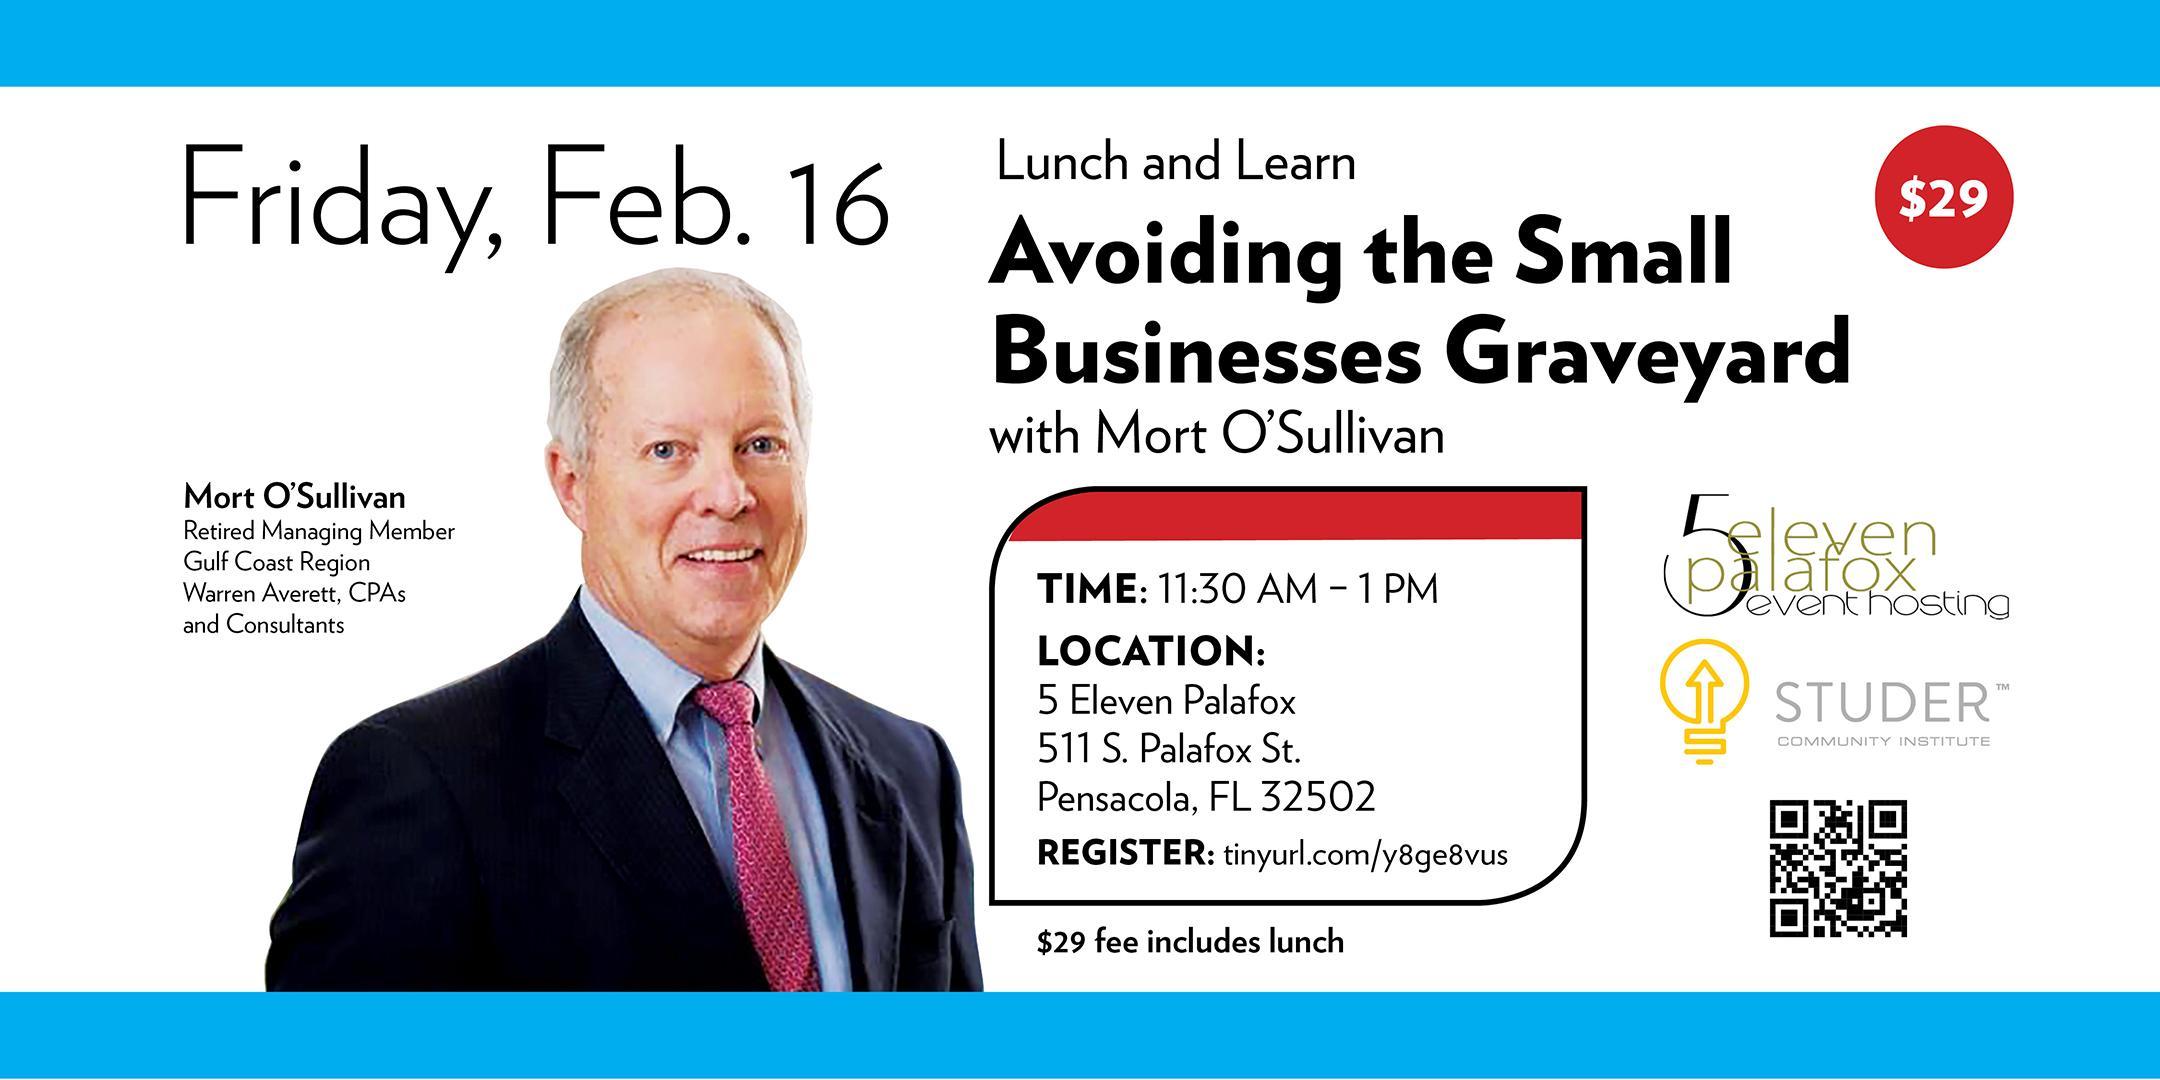 Avoiding the Small Businesses Graveyard